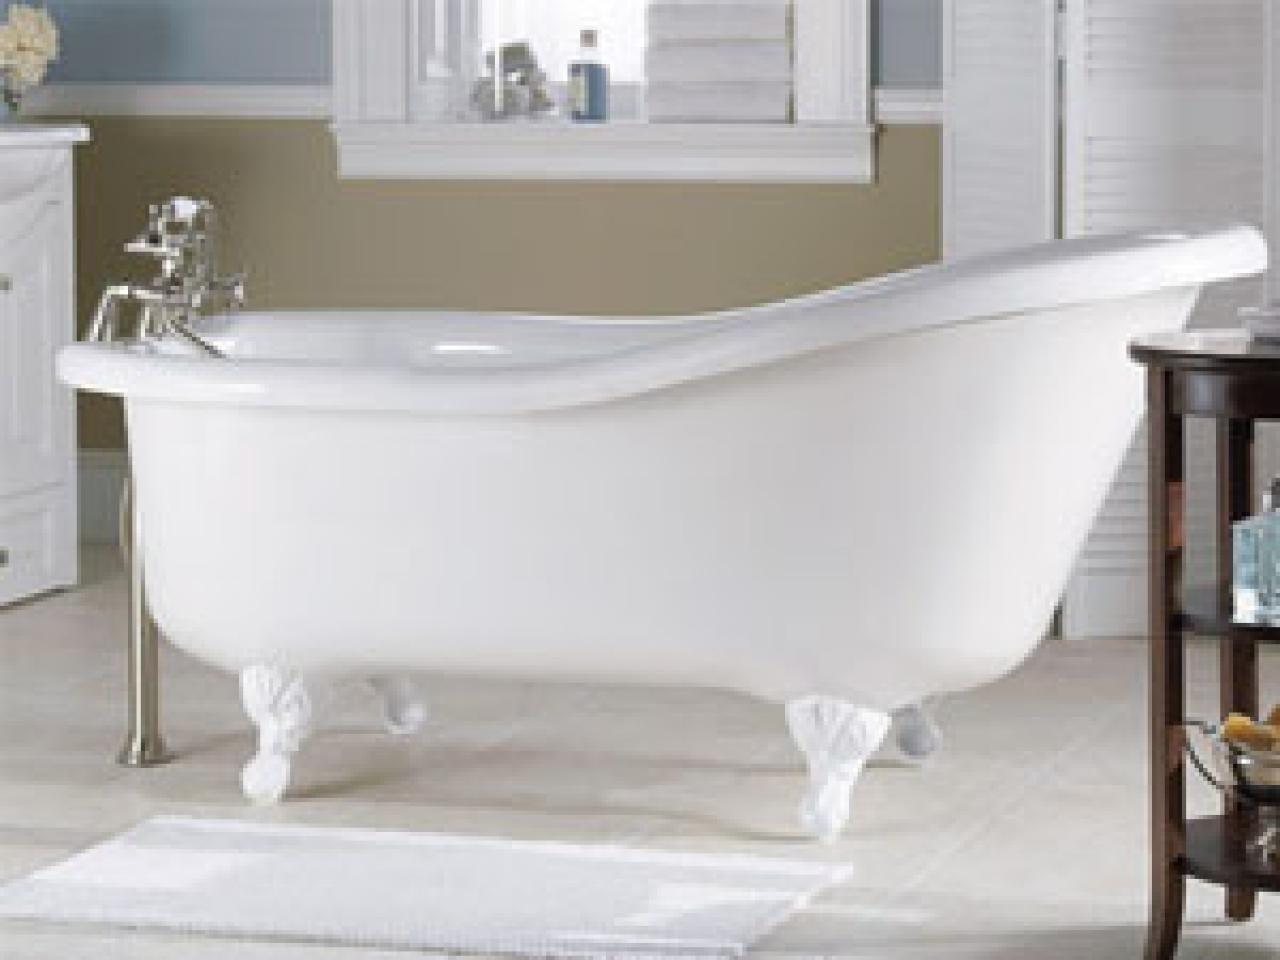 Bathroom mirror ideas diy for a small bathroom mirror crafts